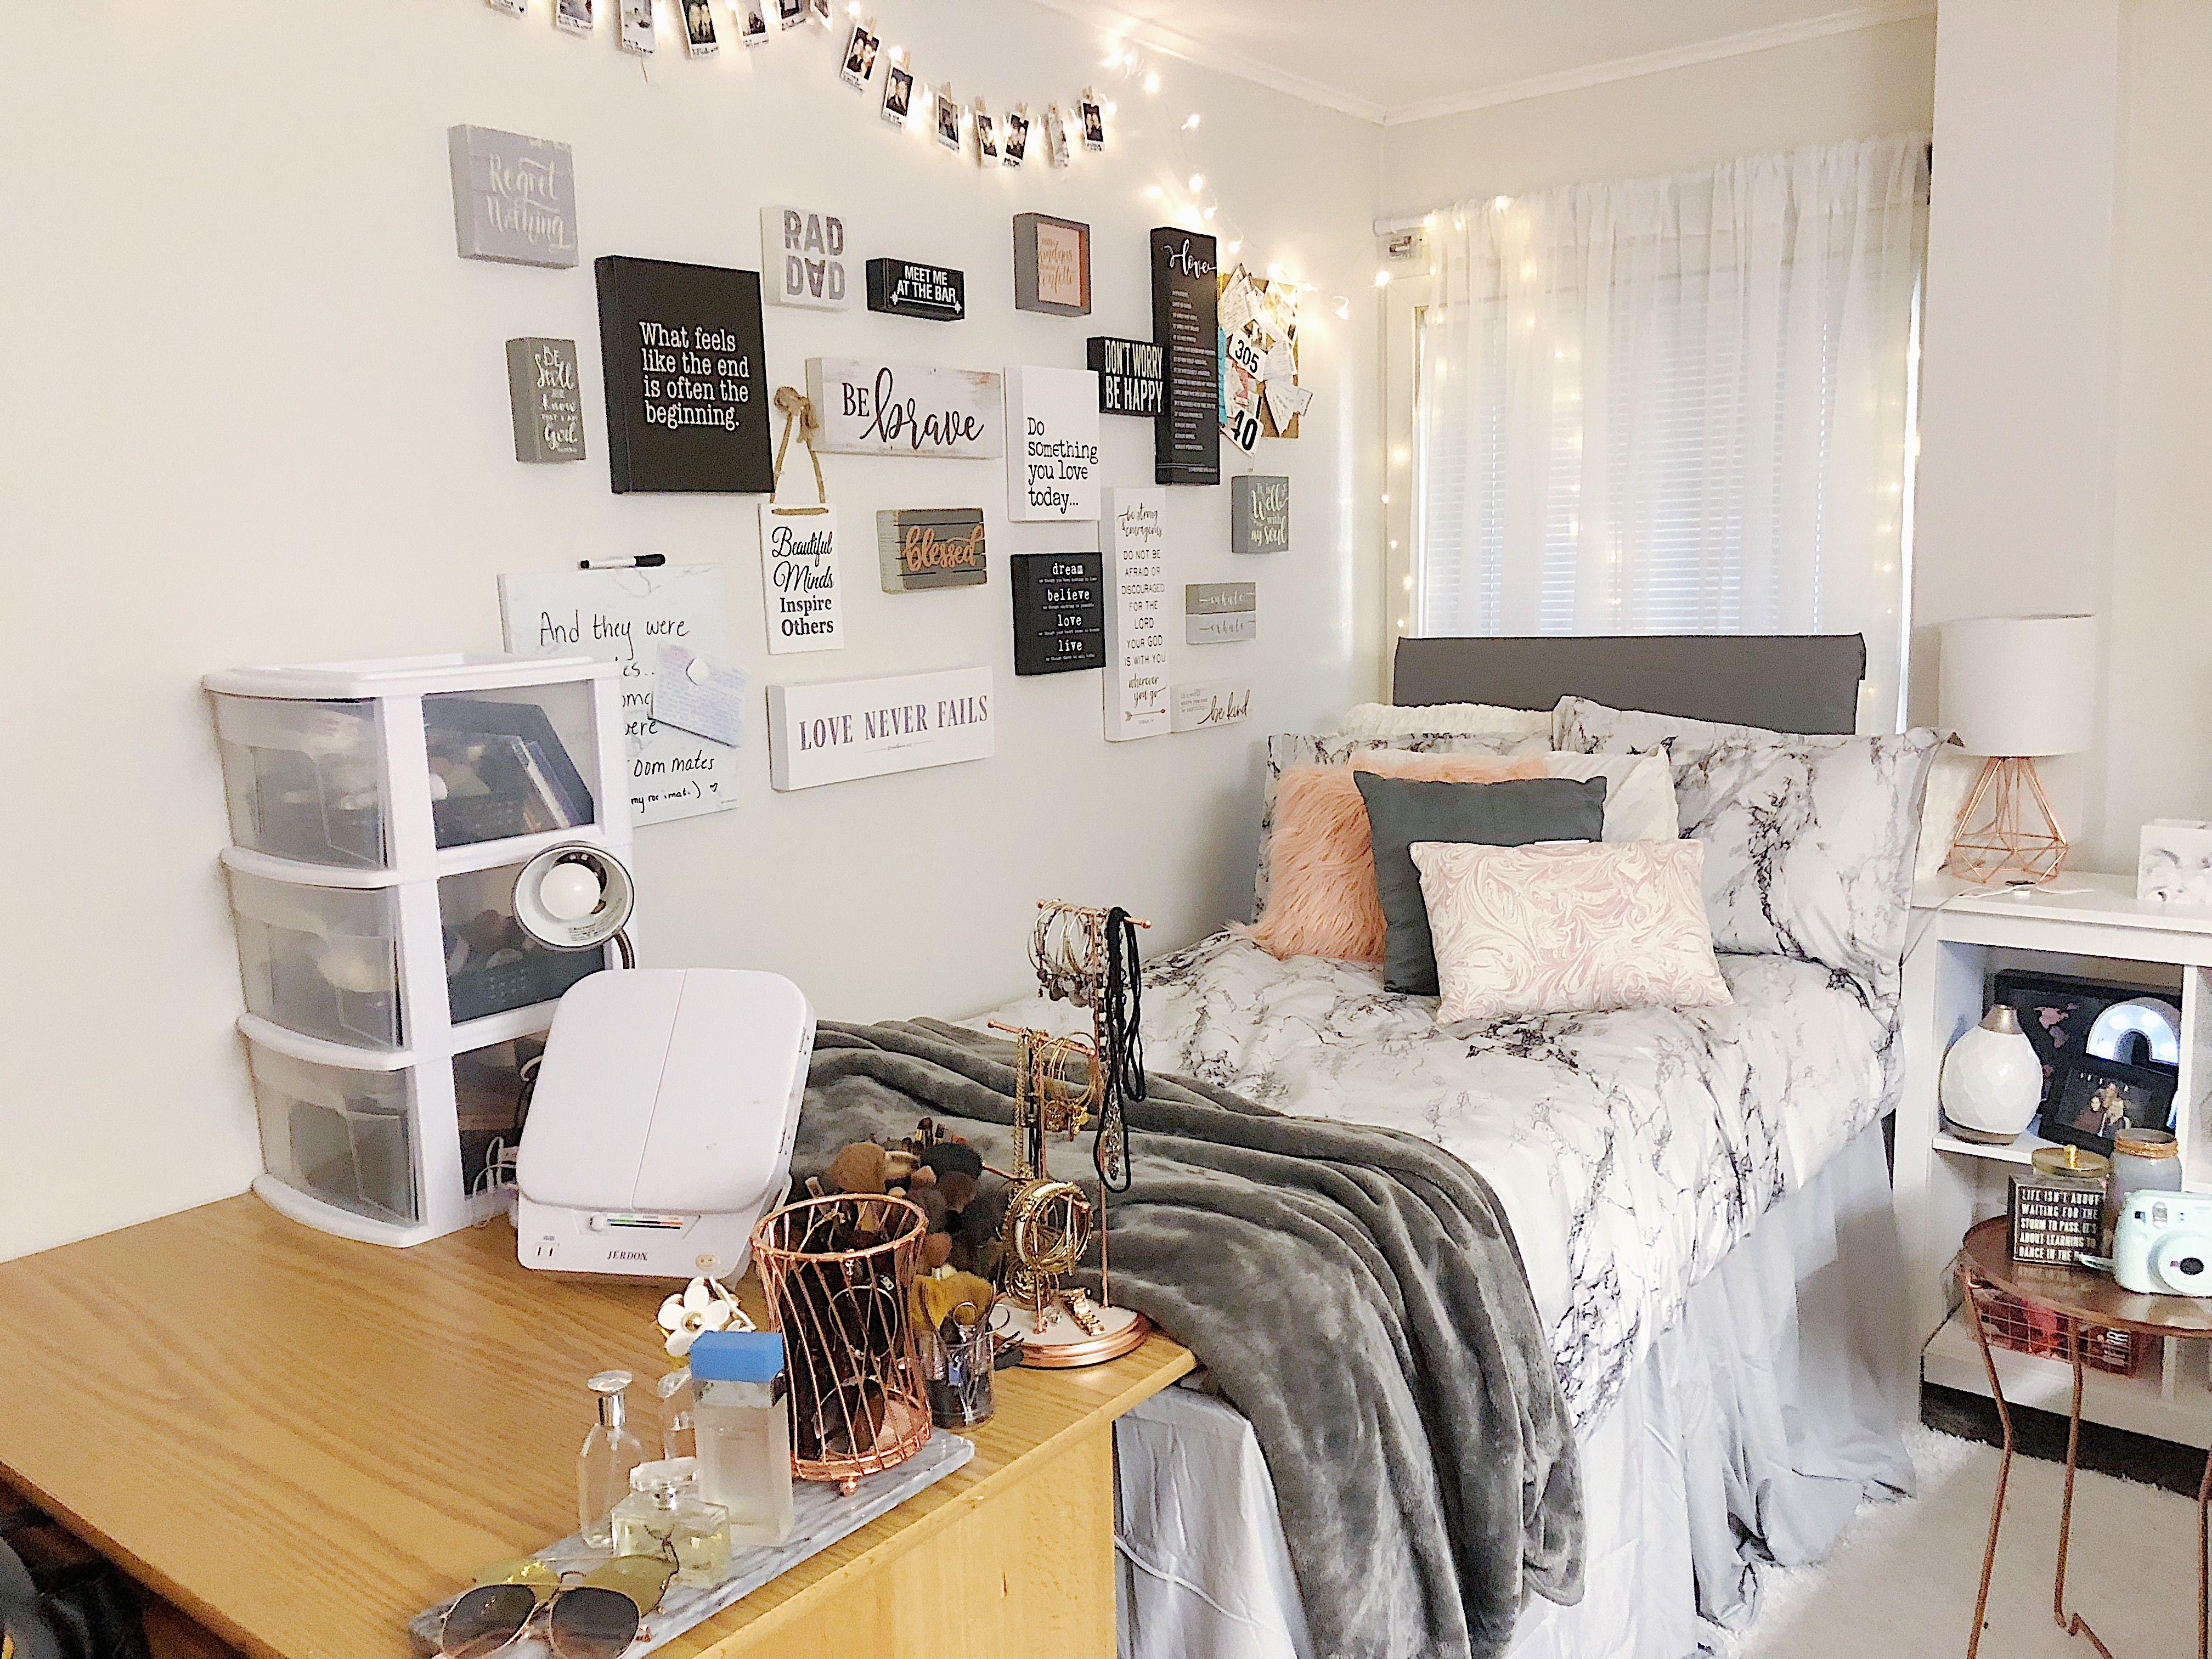 Pin By Neha Gudur On My Dorm Dorm Inspiration Dorm Room